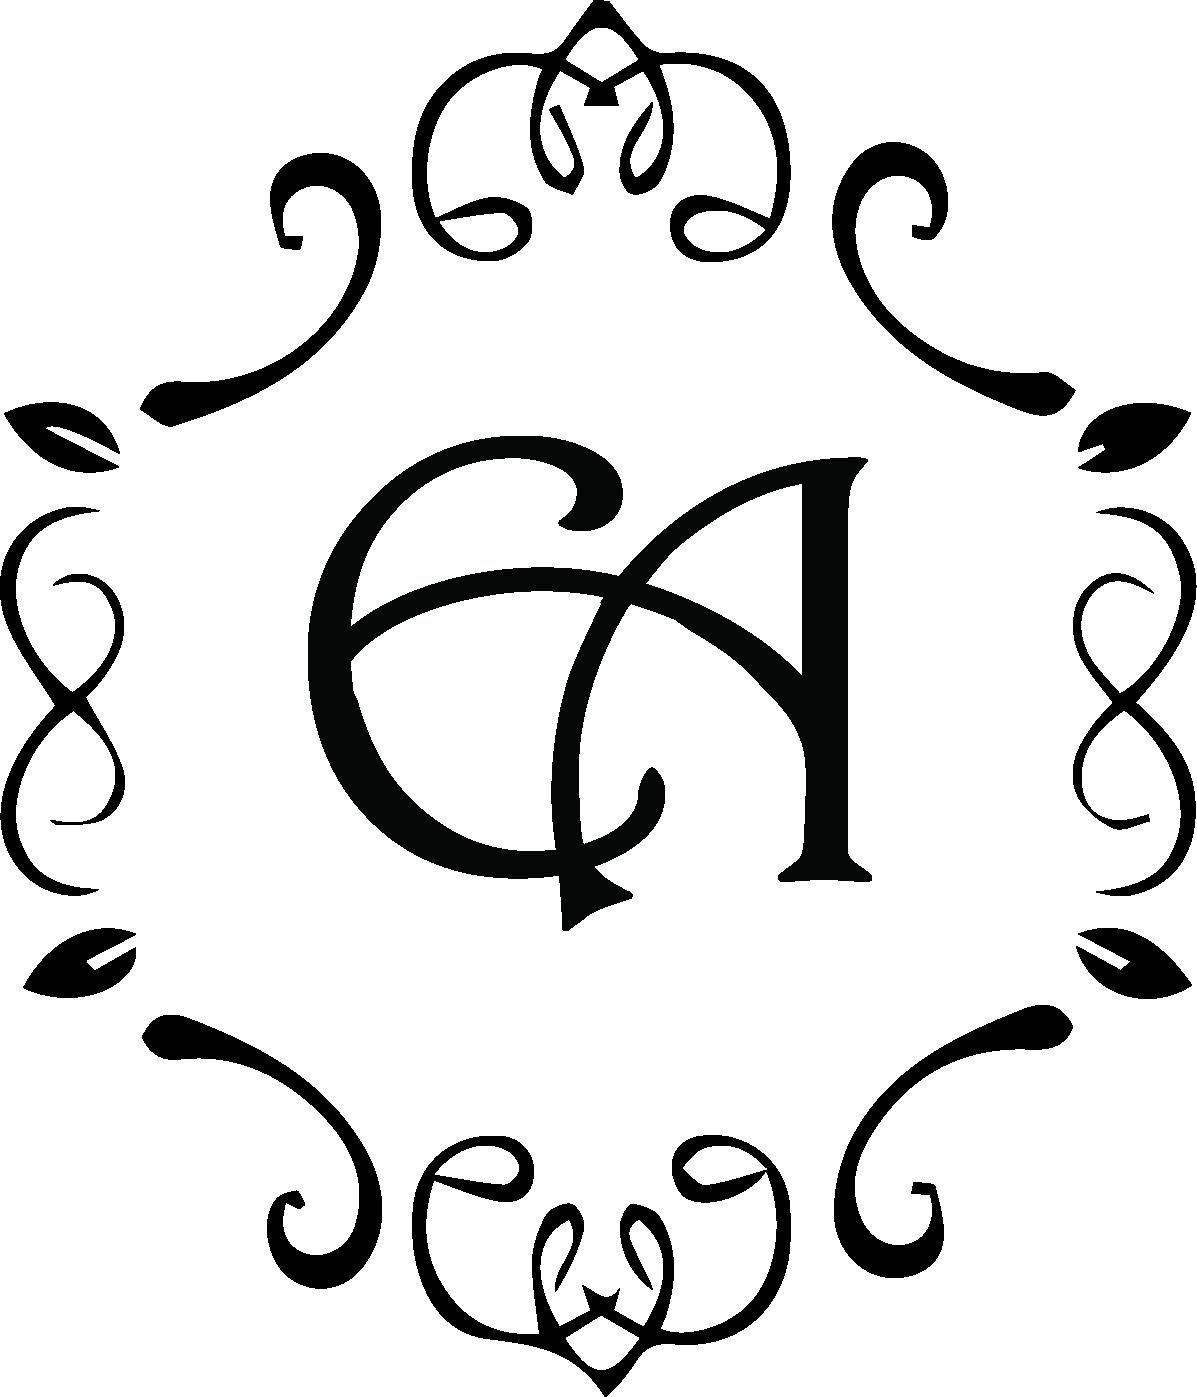 Etiquette Academy Asia |亞洲禮儀學院 | Phooi Sin Hor | 禮儀學院 | 禮儀